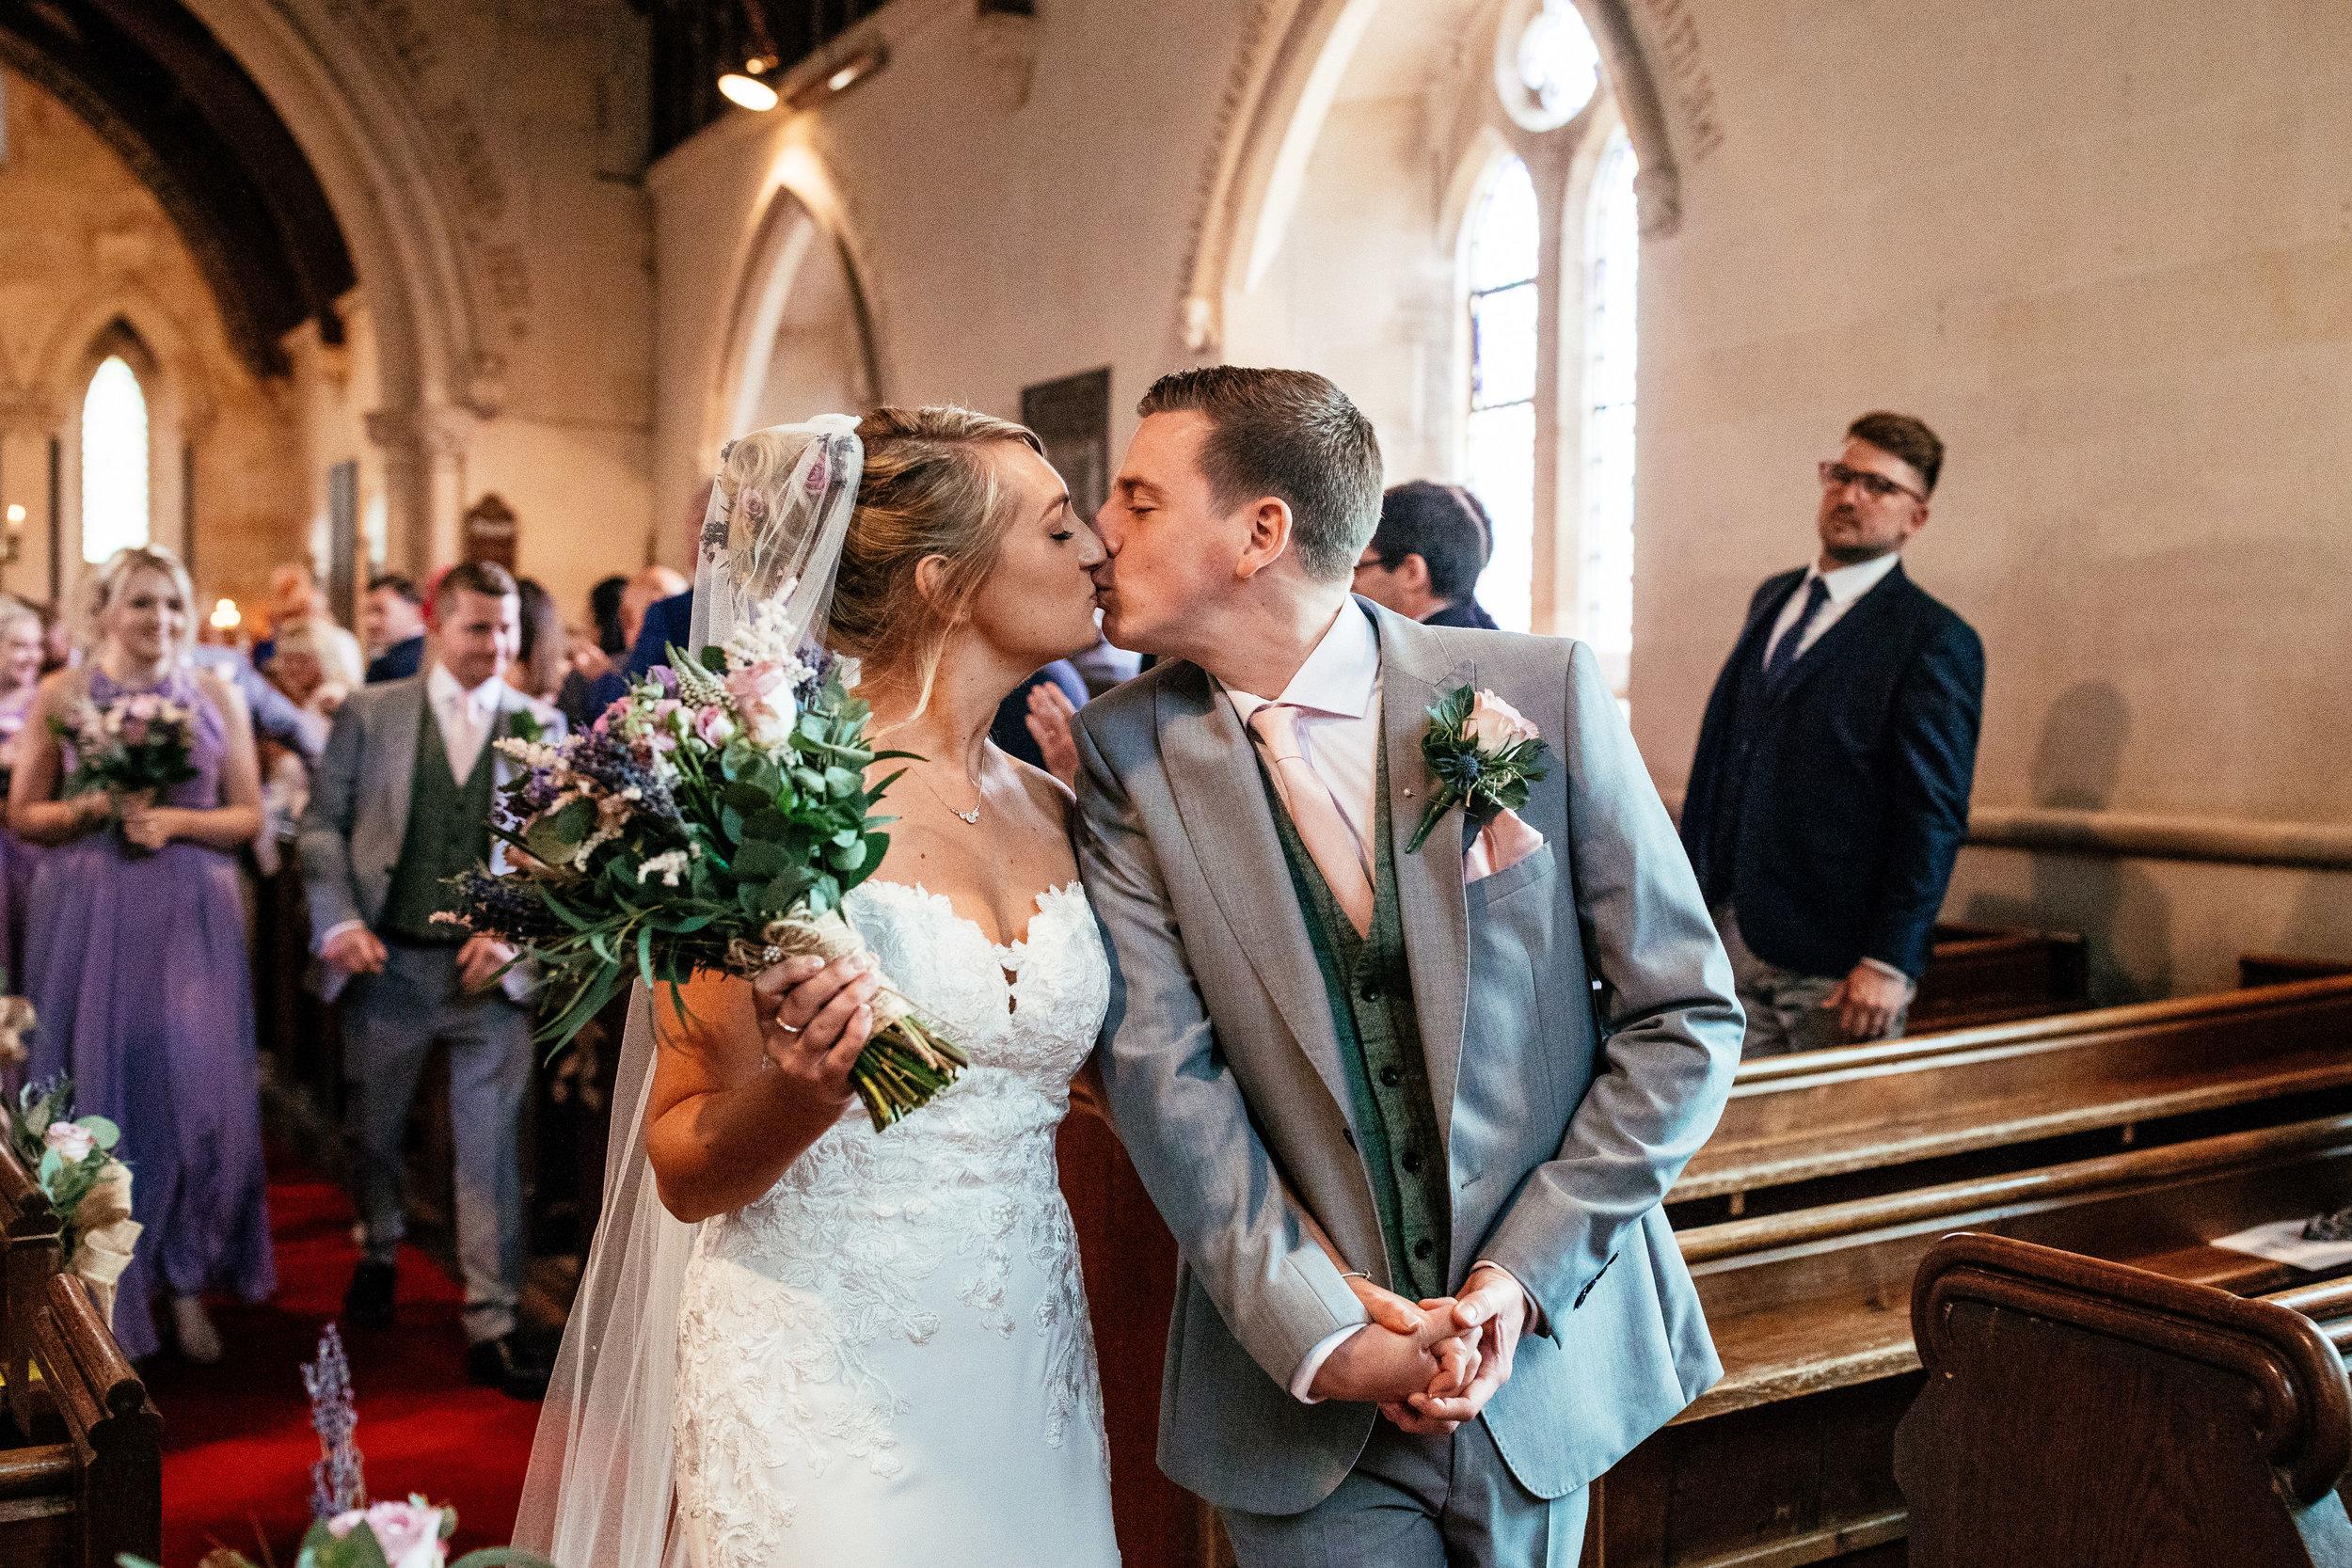 Becky-and-Sam-Wedding-Highlights-21.jpg